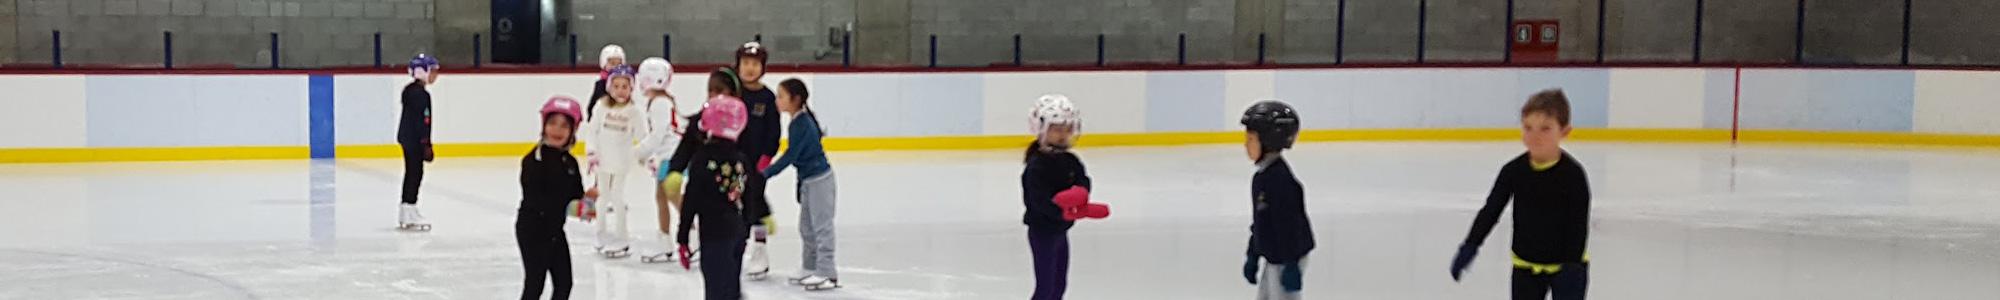 Skate Development